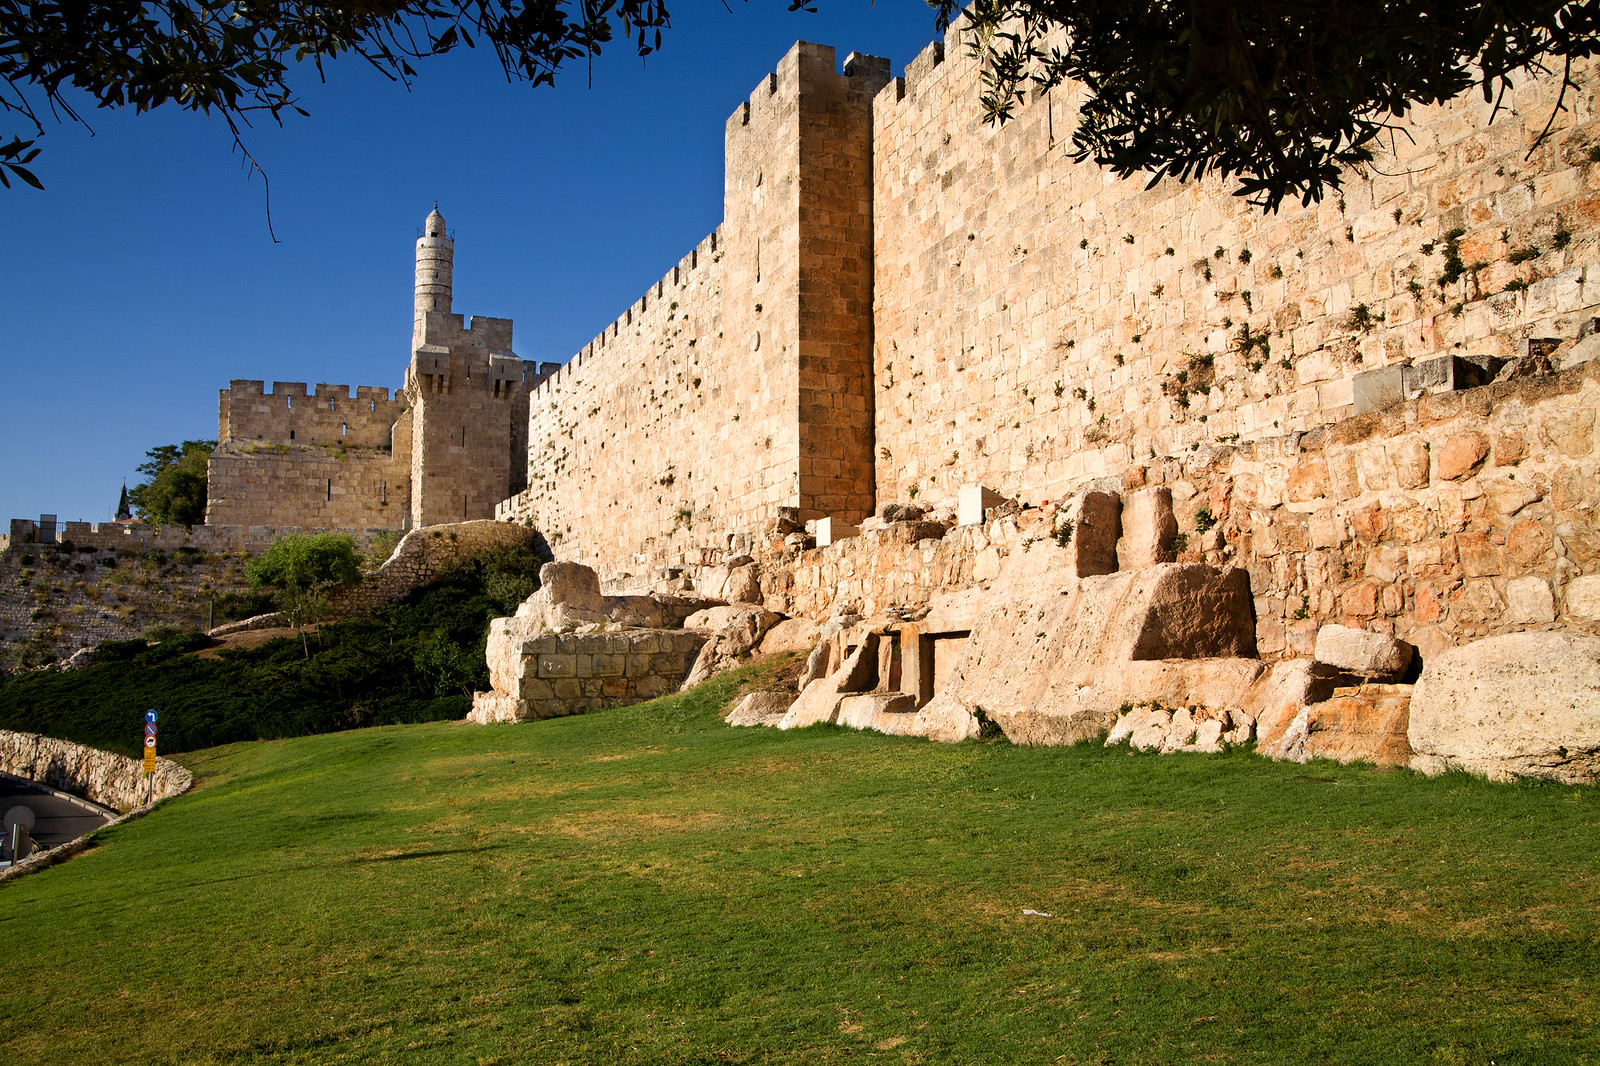 Jerusalem_The Tower of David_5_Noam Chen_IMOT